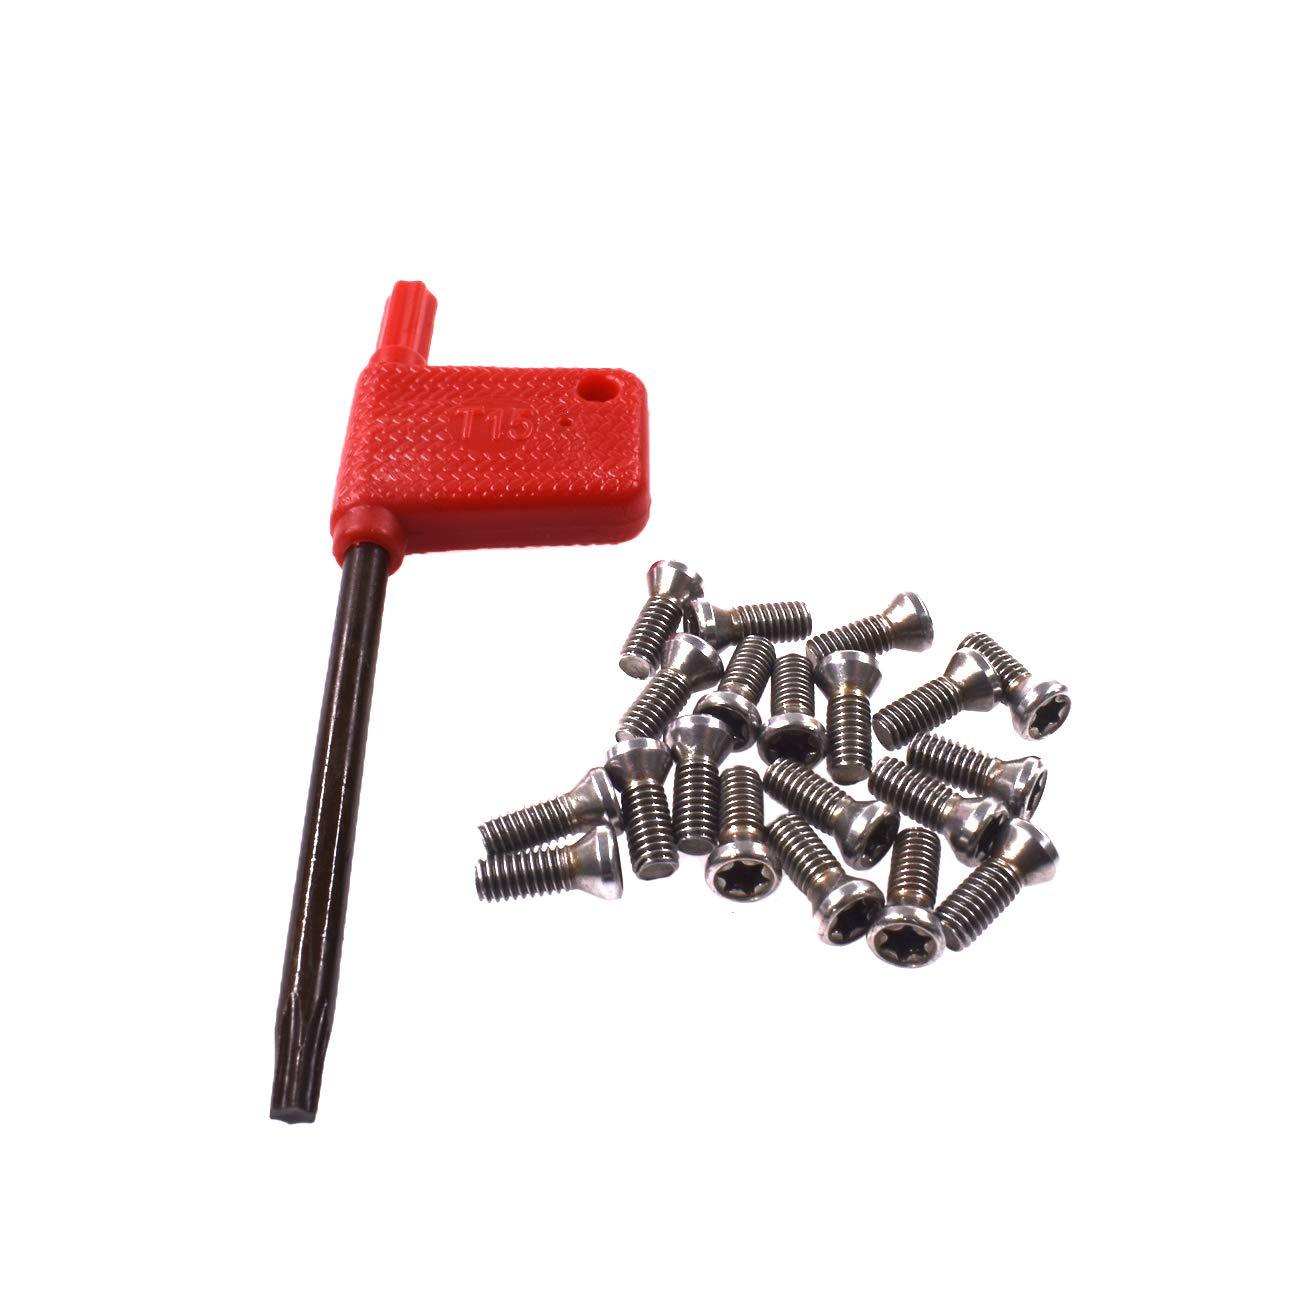 HGC 20pcs M3.5x10 Alloy Steel Torx Screws For Replaces Carbide Insert CNC Lathe Tool Dazhong Machinery